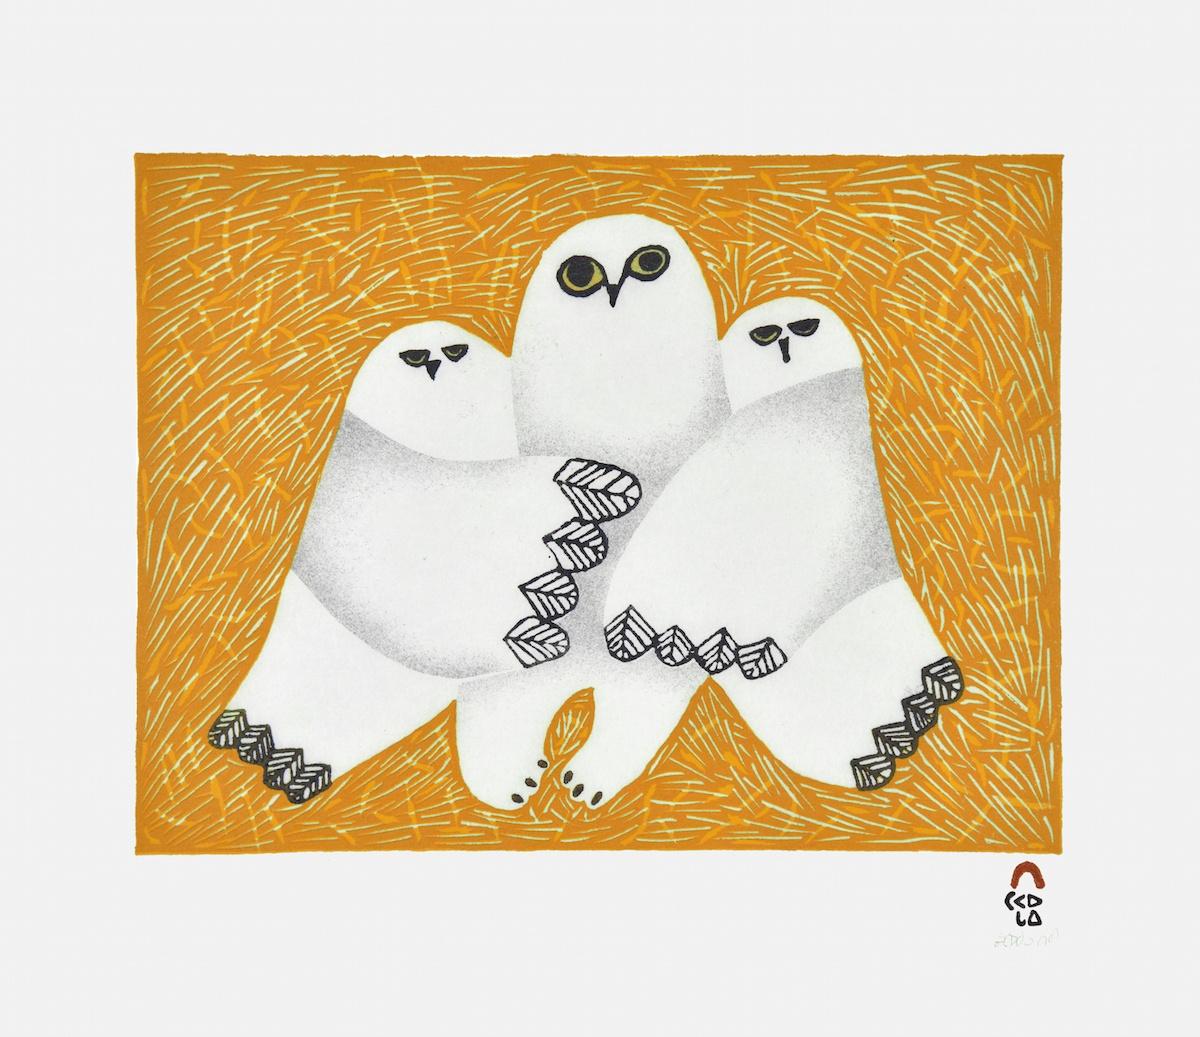 Cuddle Cape Dorset Print Collection 2015 Artist: Ningeokuluk Teevee Medium: Stonecut & Stencil Paper: Handmade Washi Kizuki Kozo White Printer: Tapaungai Niviaqsi Size: 11 x 13 inches (28 x 32.5 cm) Price: $500